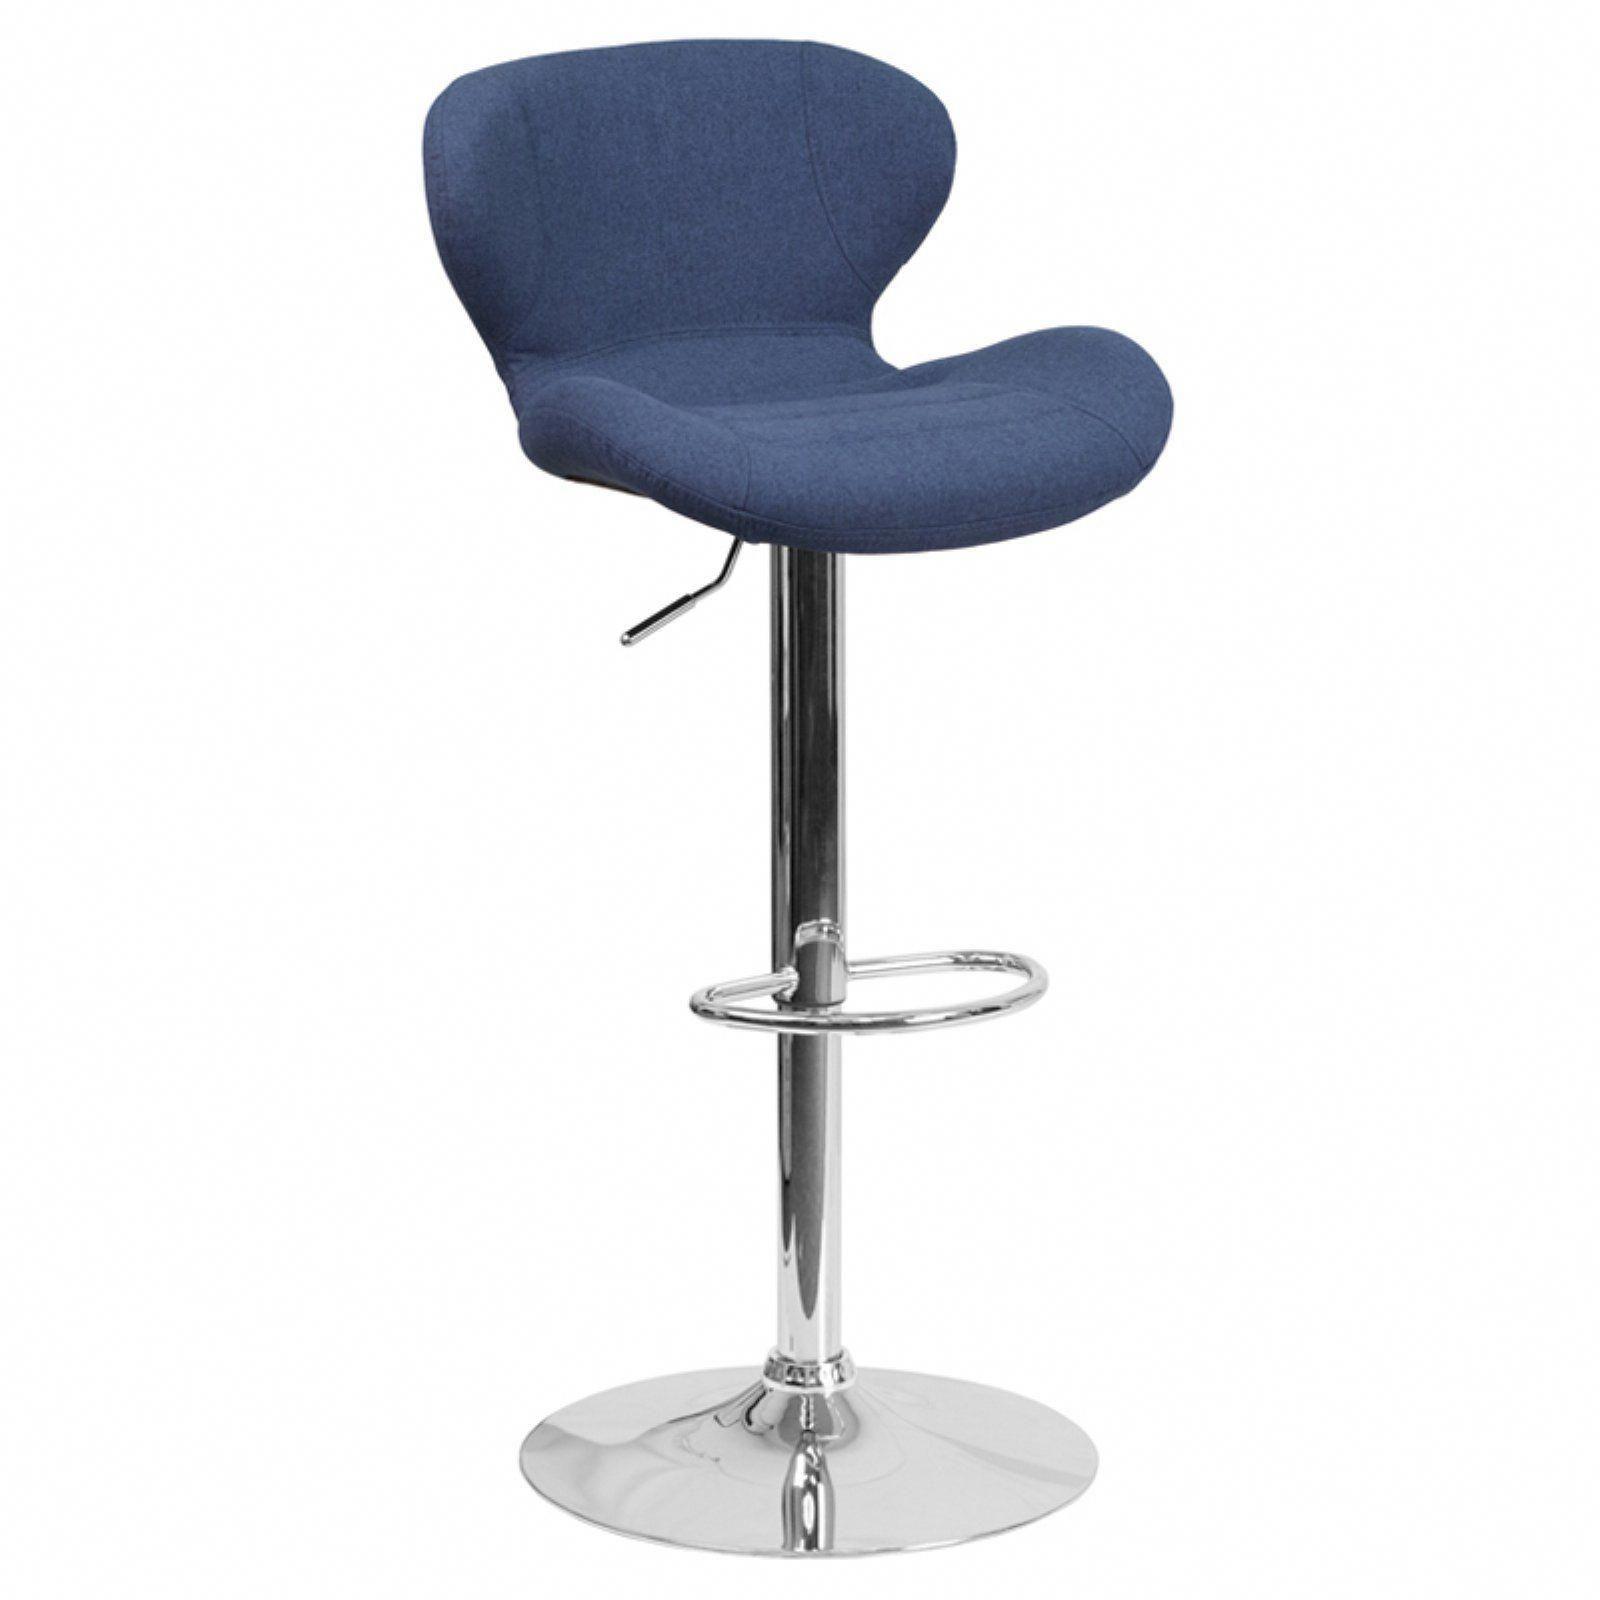 Herman miller aeron chair size b chairswithwoodenarms in